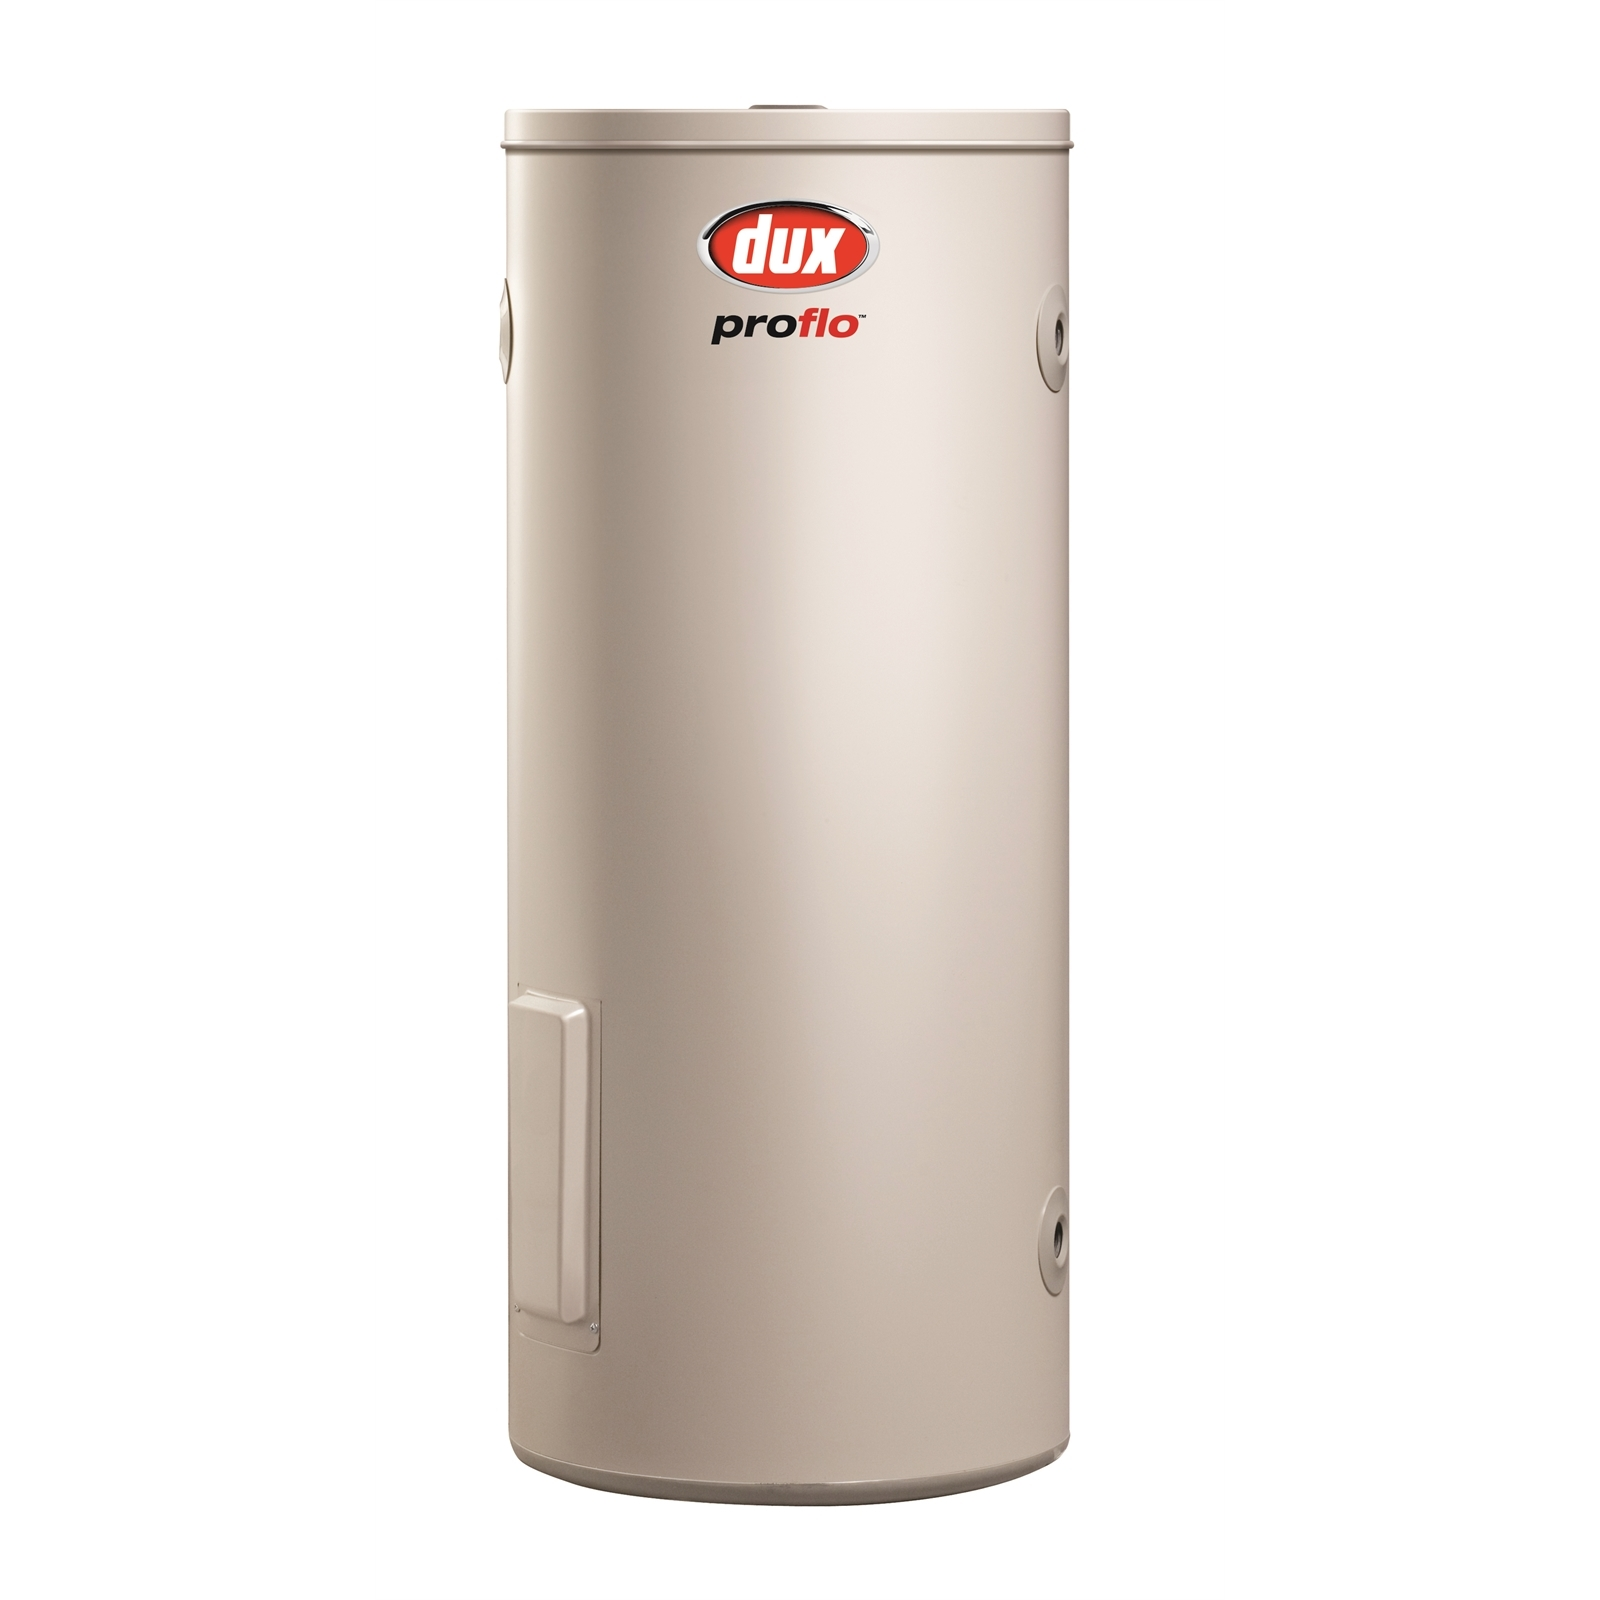 Dux 125L 1.8kW Proflo Electric Storage Water Heater